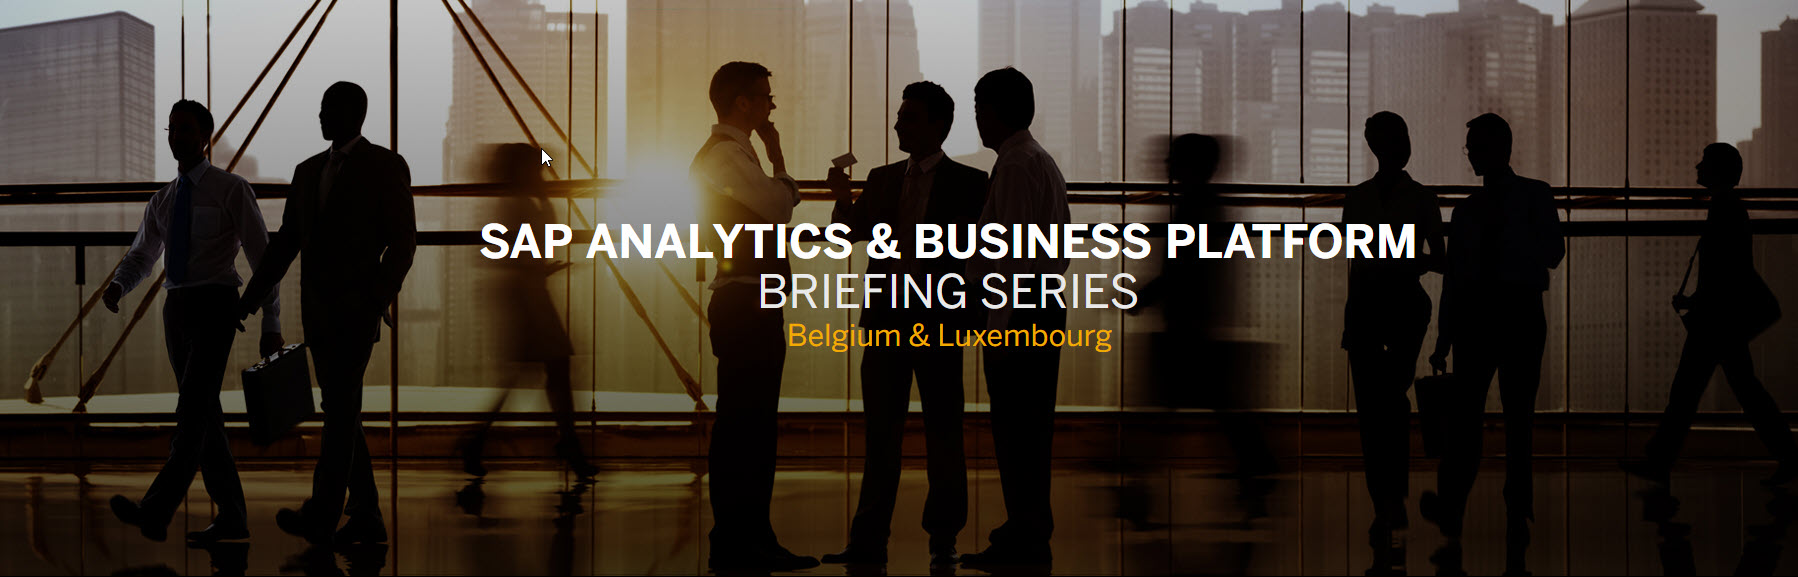 SAP BW/4 HANA, The Big Data Warehouse for Digital Enterprises